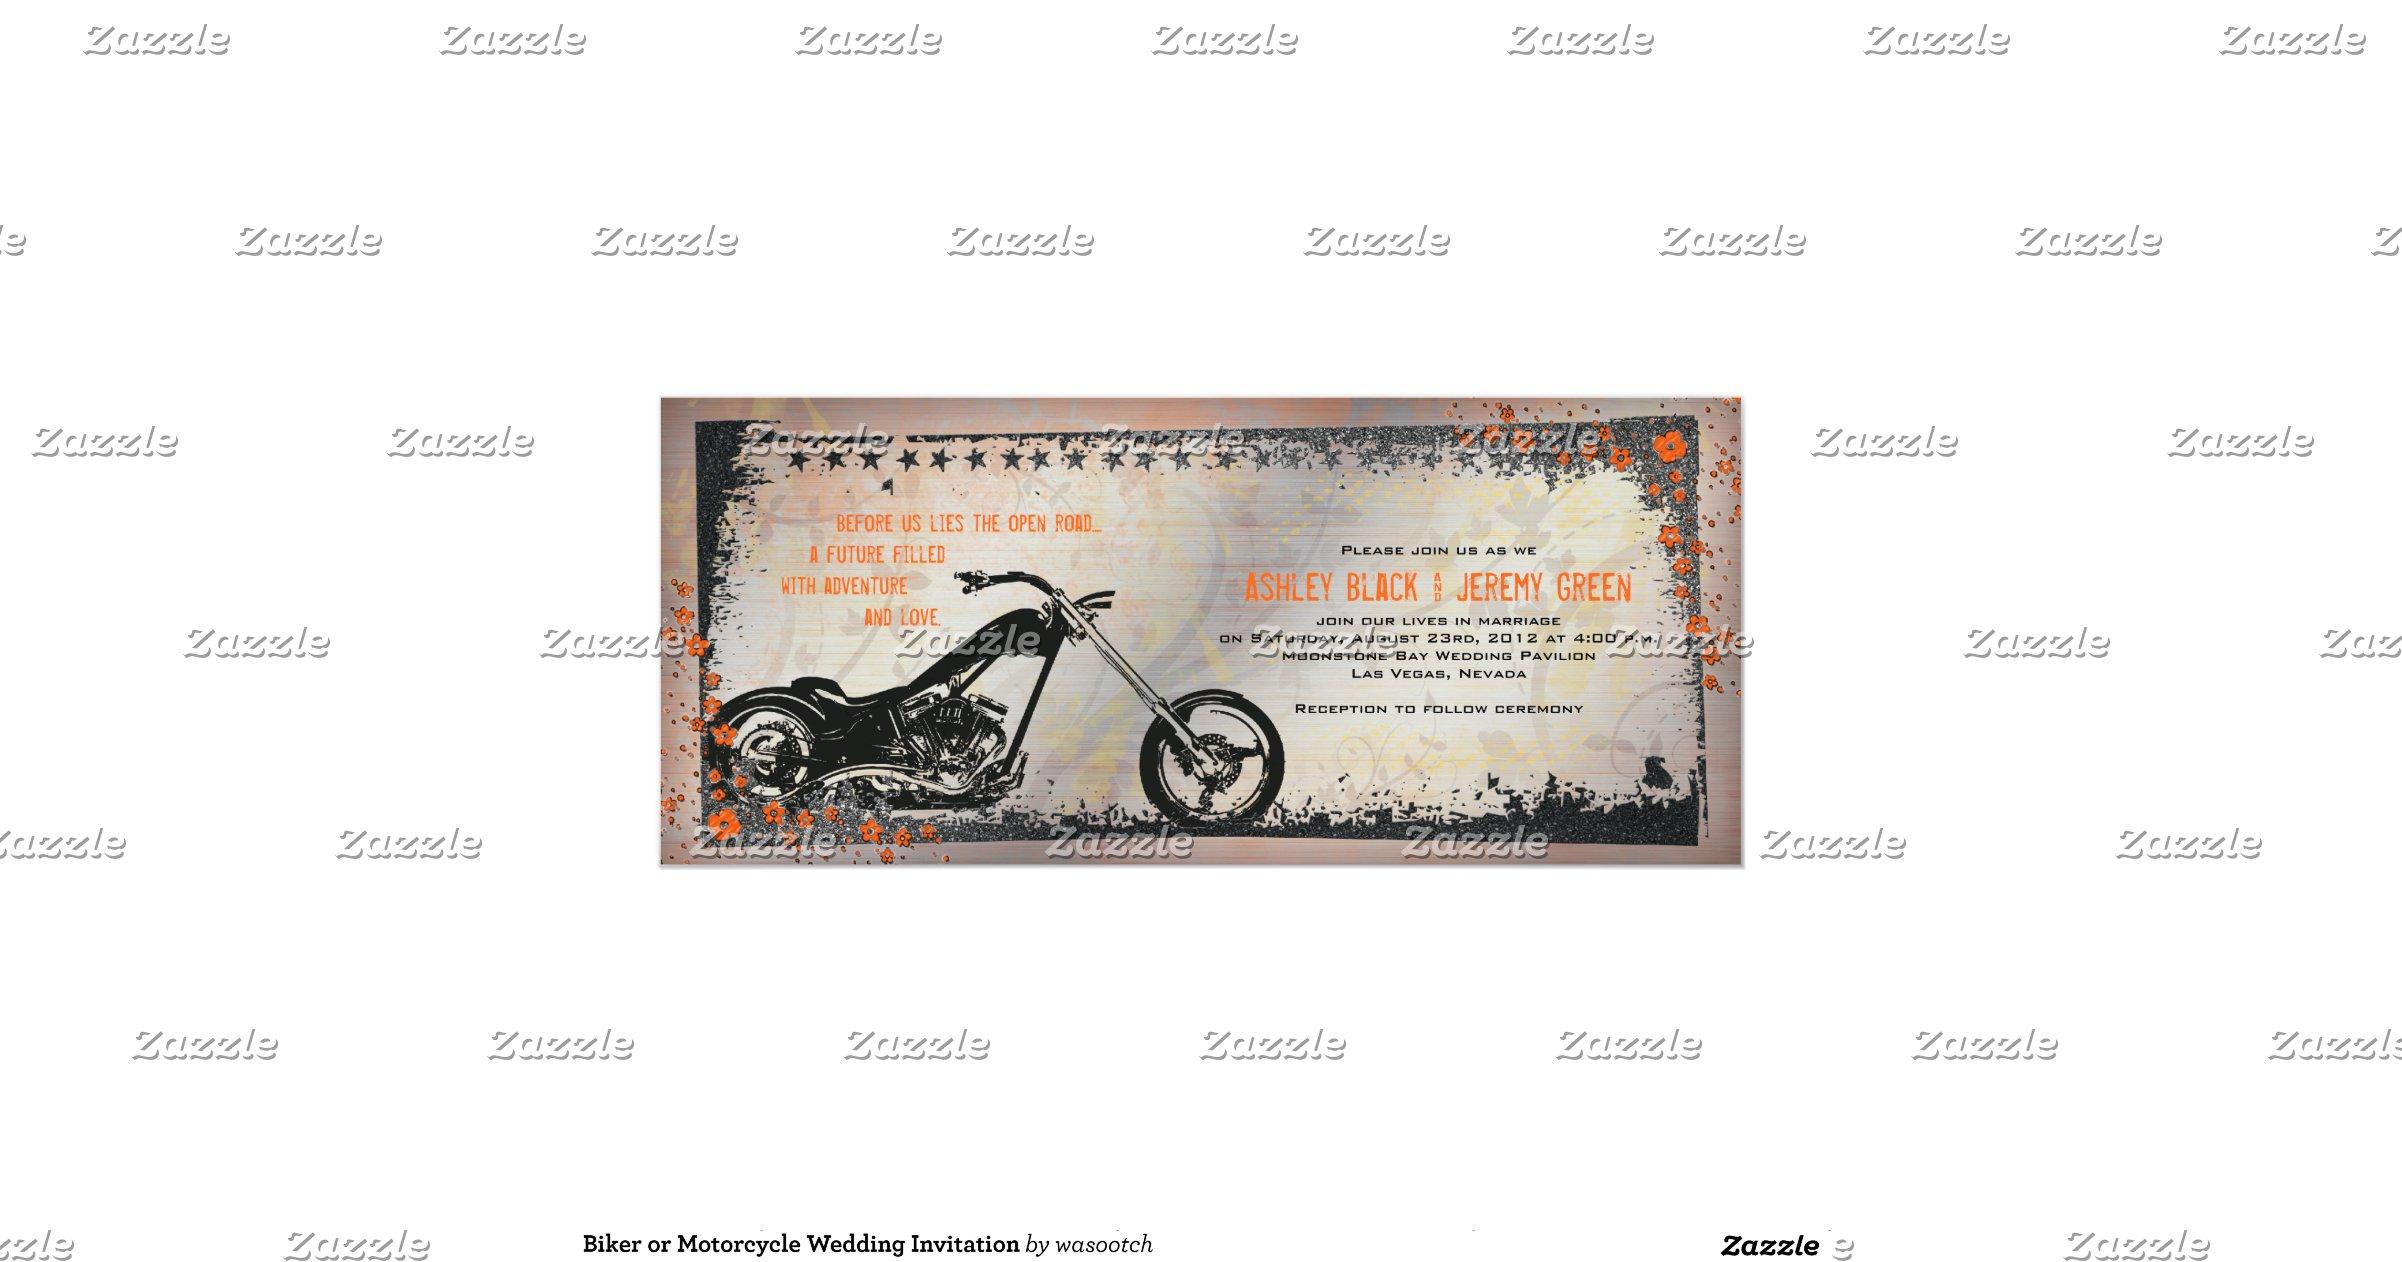 Biker Wedding Invitations: Biker_or_motorcycle_wedding_invitation